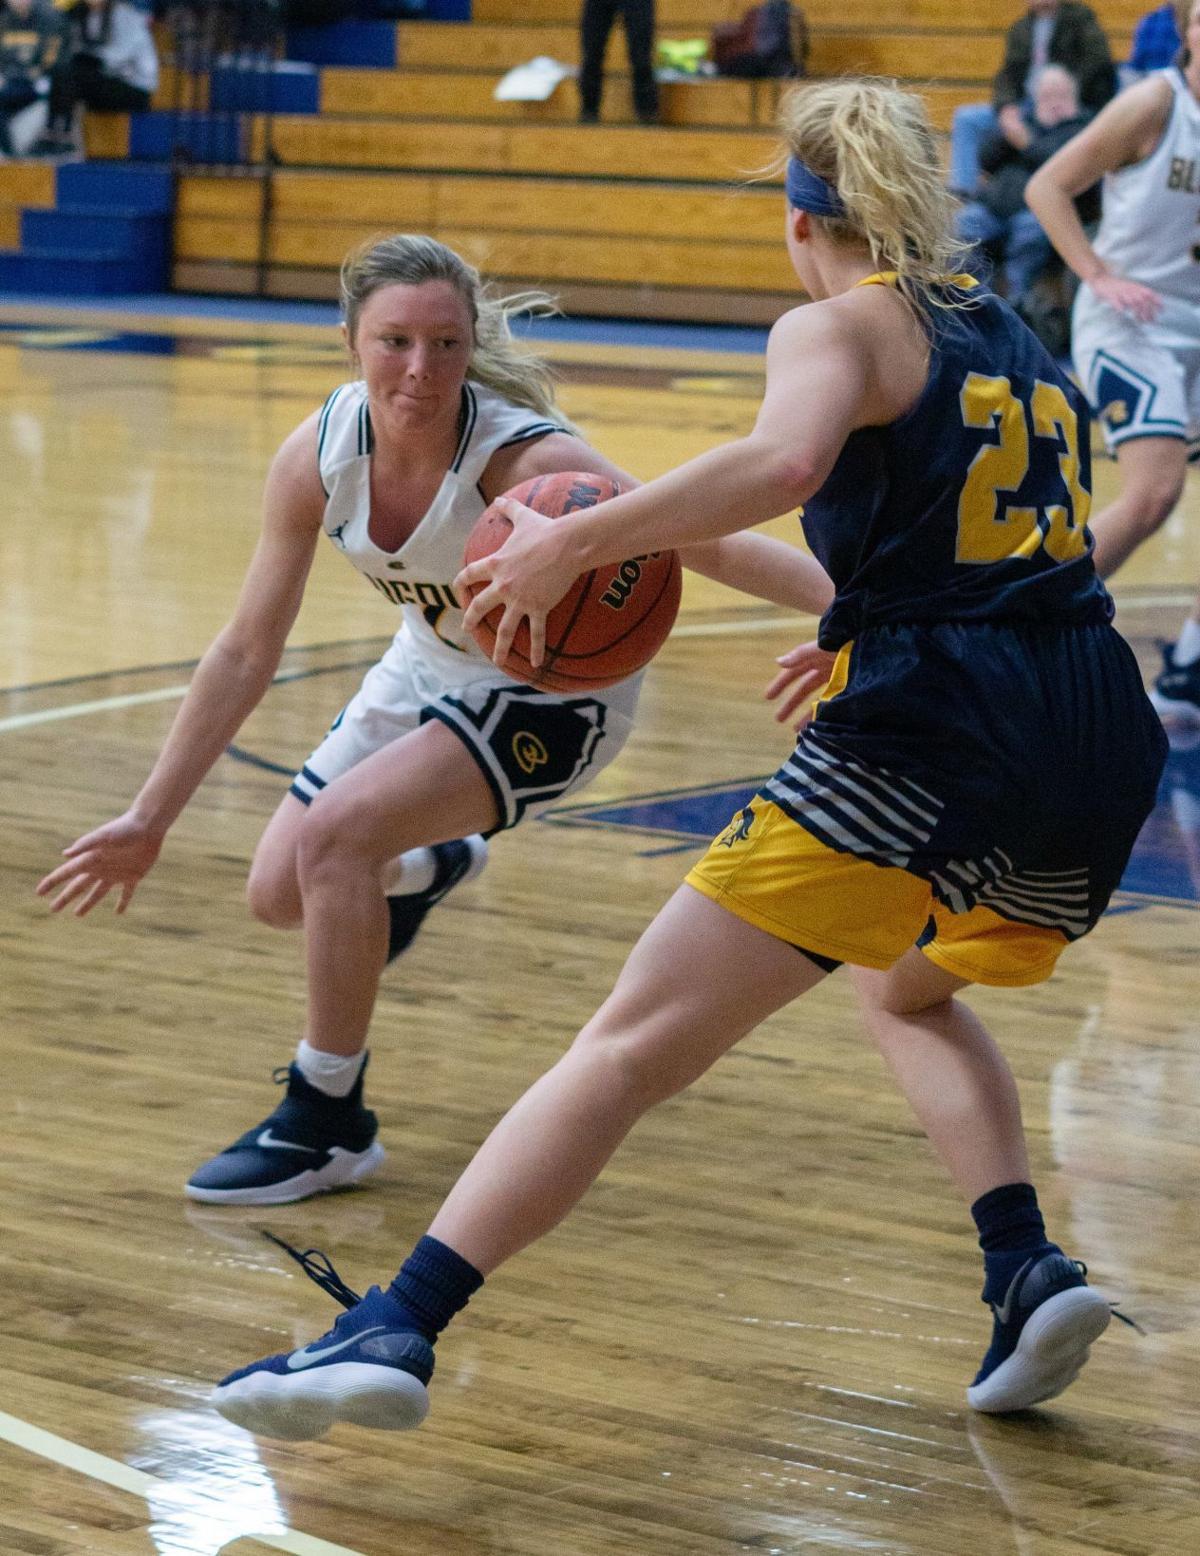 Women's basketball: Hoeppner scores 31 as Blugolds overcome